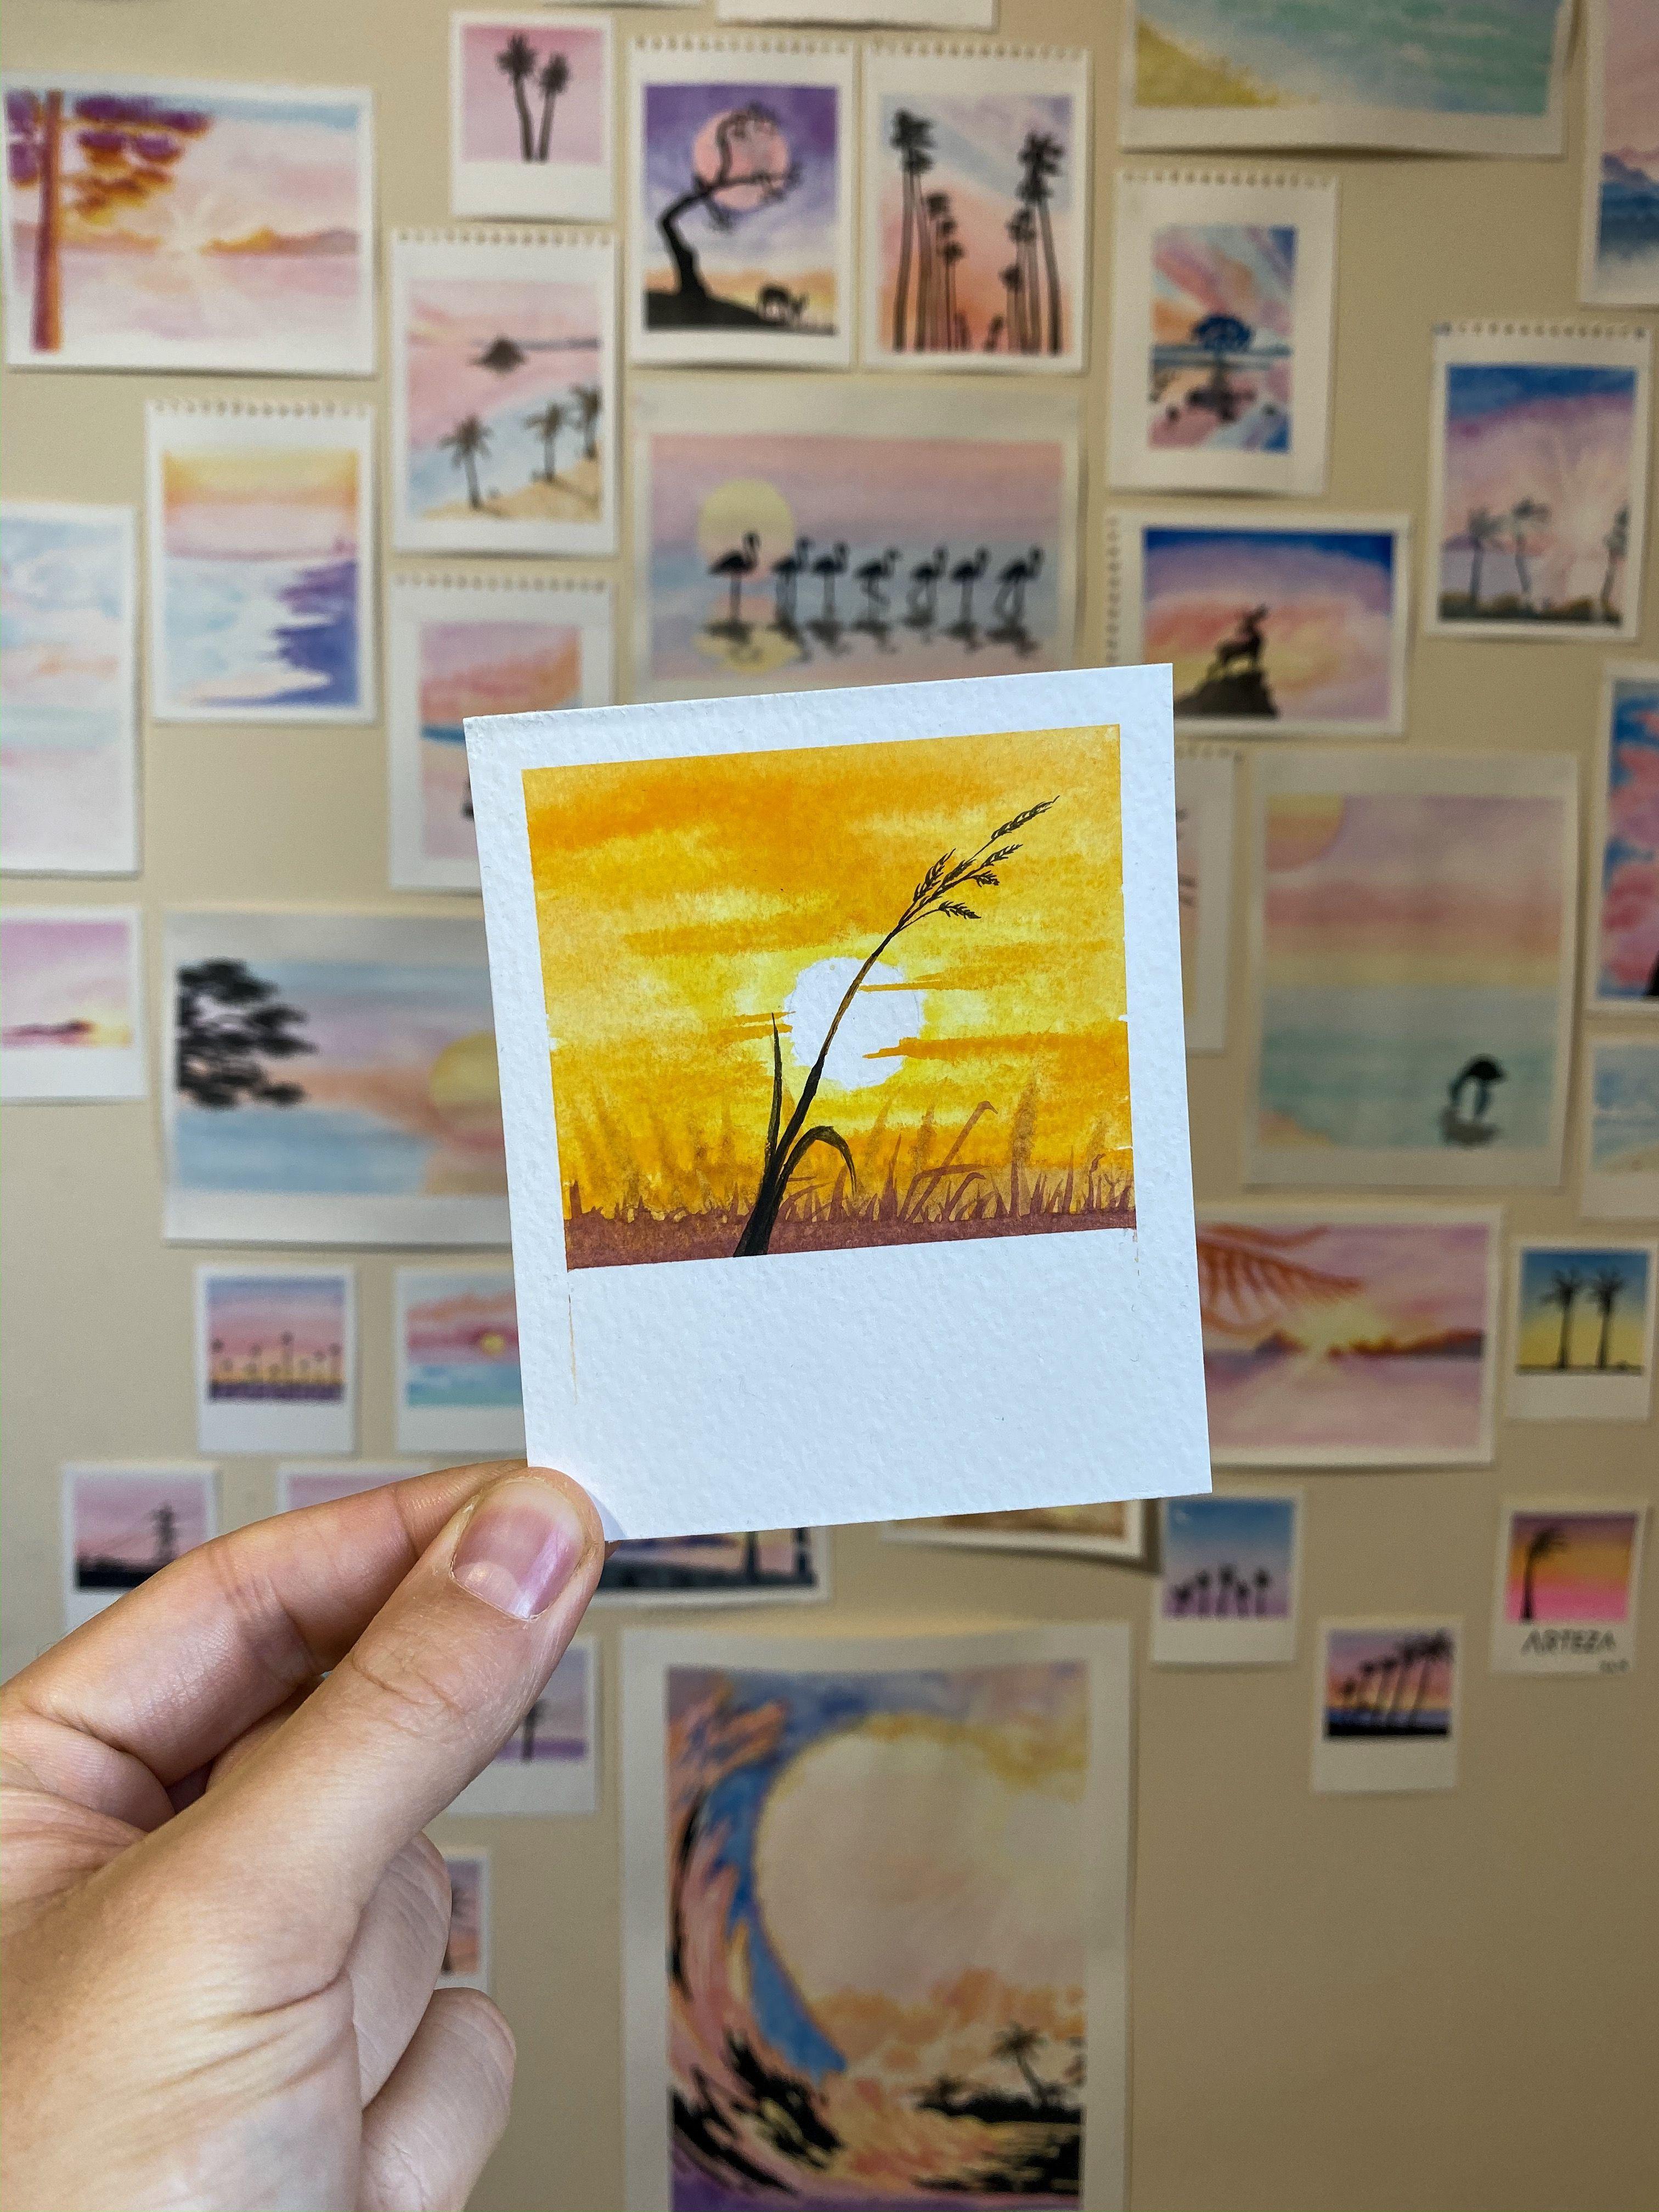 WHEAT - #wheat -  WHEAT   DIY malen Ein minimales, wärmendes Polaroid • #watercolorpainting #paintbrushpolaroids #Aquarell #artistsoninstagram